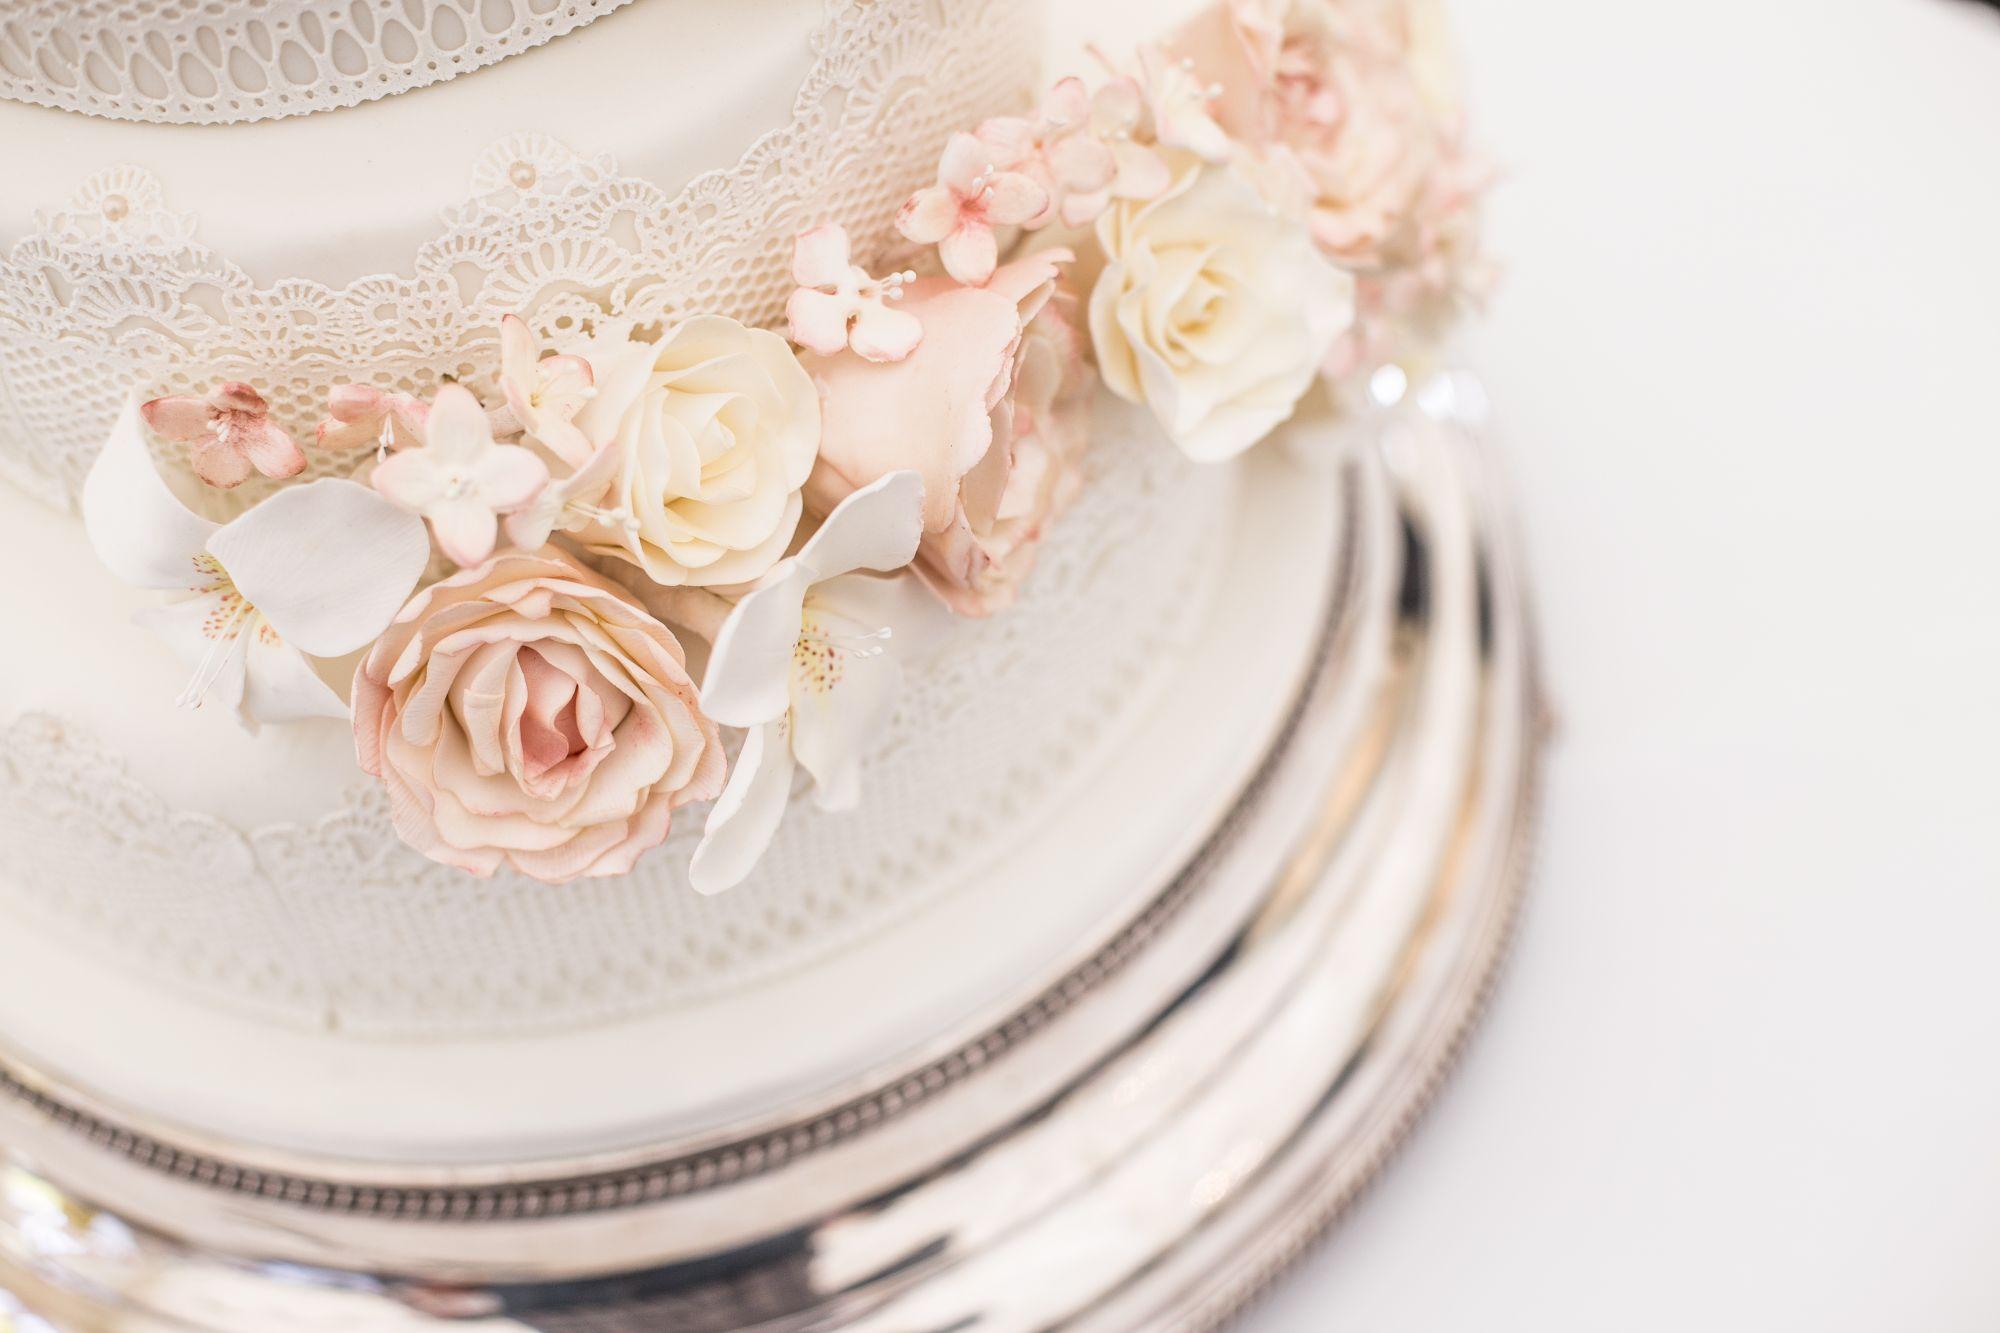 The Best Bespoke Wedding Cake Designers In Singapore